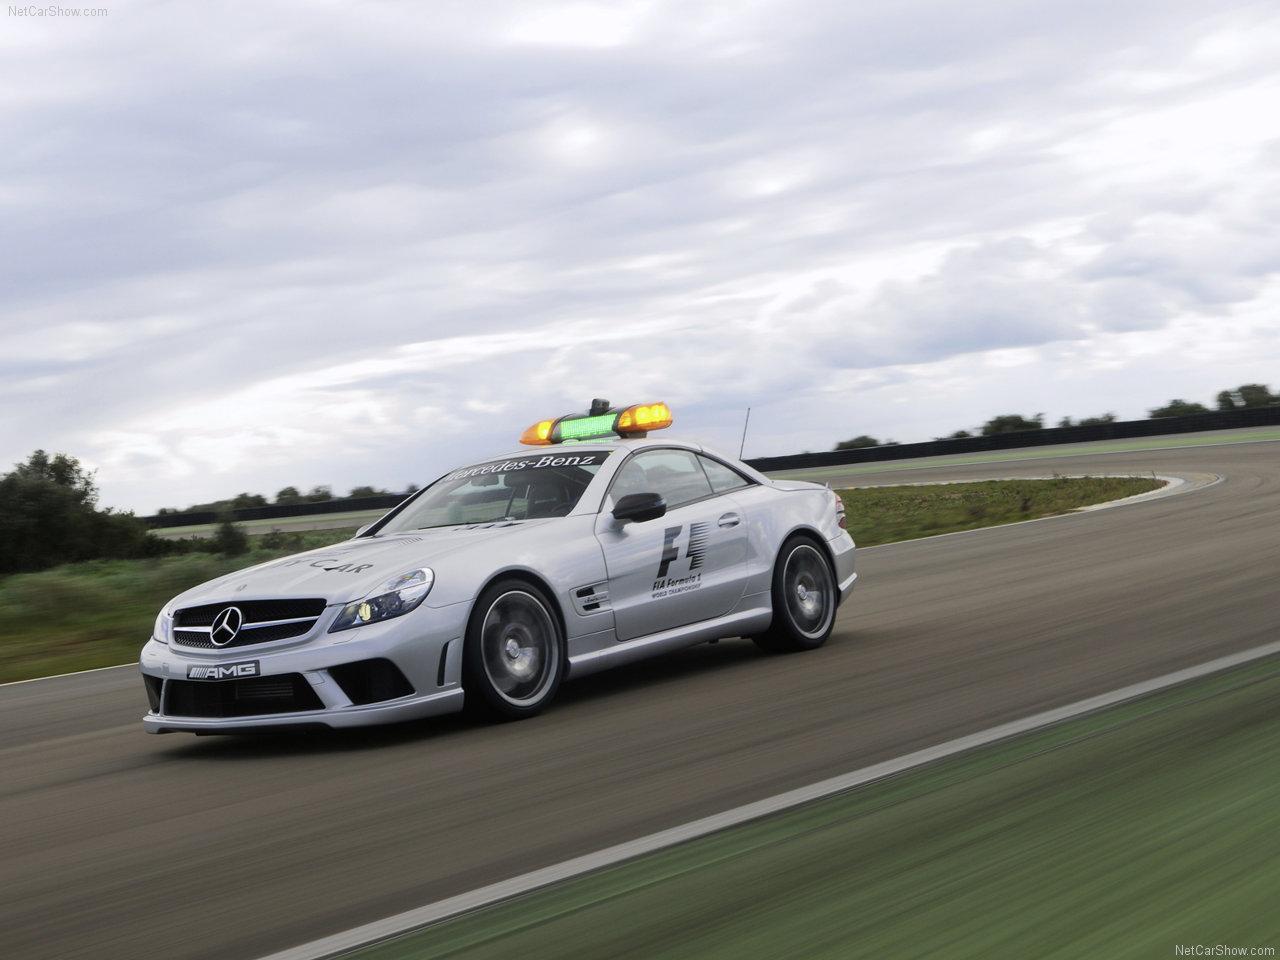 http://3.bp.blogspot.com/-iaoyQn4Se40/TWoJmz-v77I/AAAAAAACLQA/83dHGcKyMfc/s1600/Mercedes-Benz-SL63_AMG_F1_Safety_Car_2009_1280x960_wallpaper_03.jpg